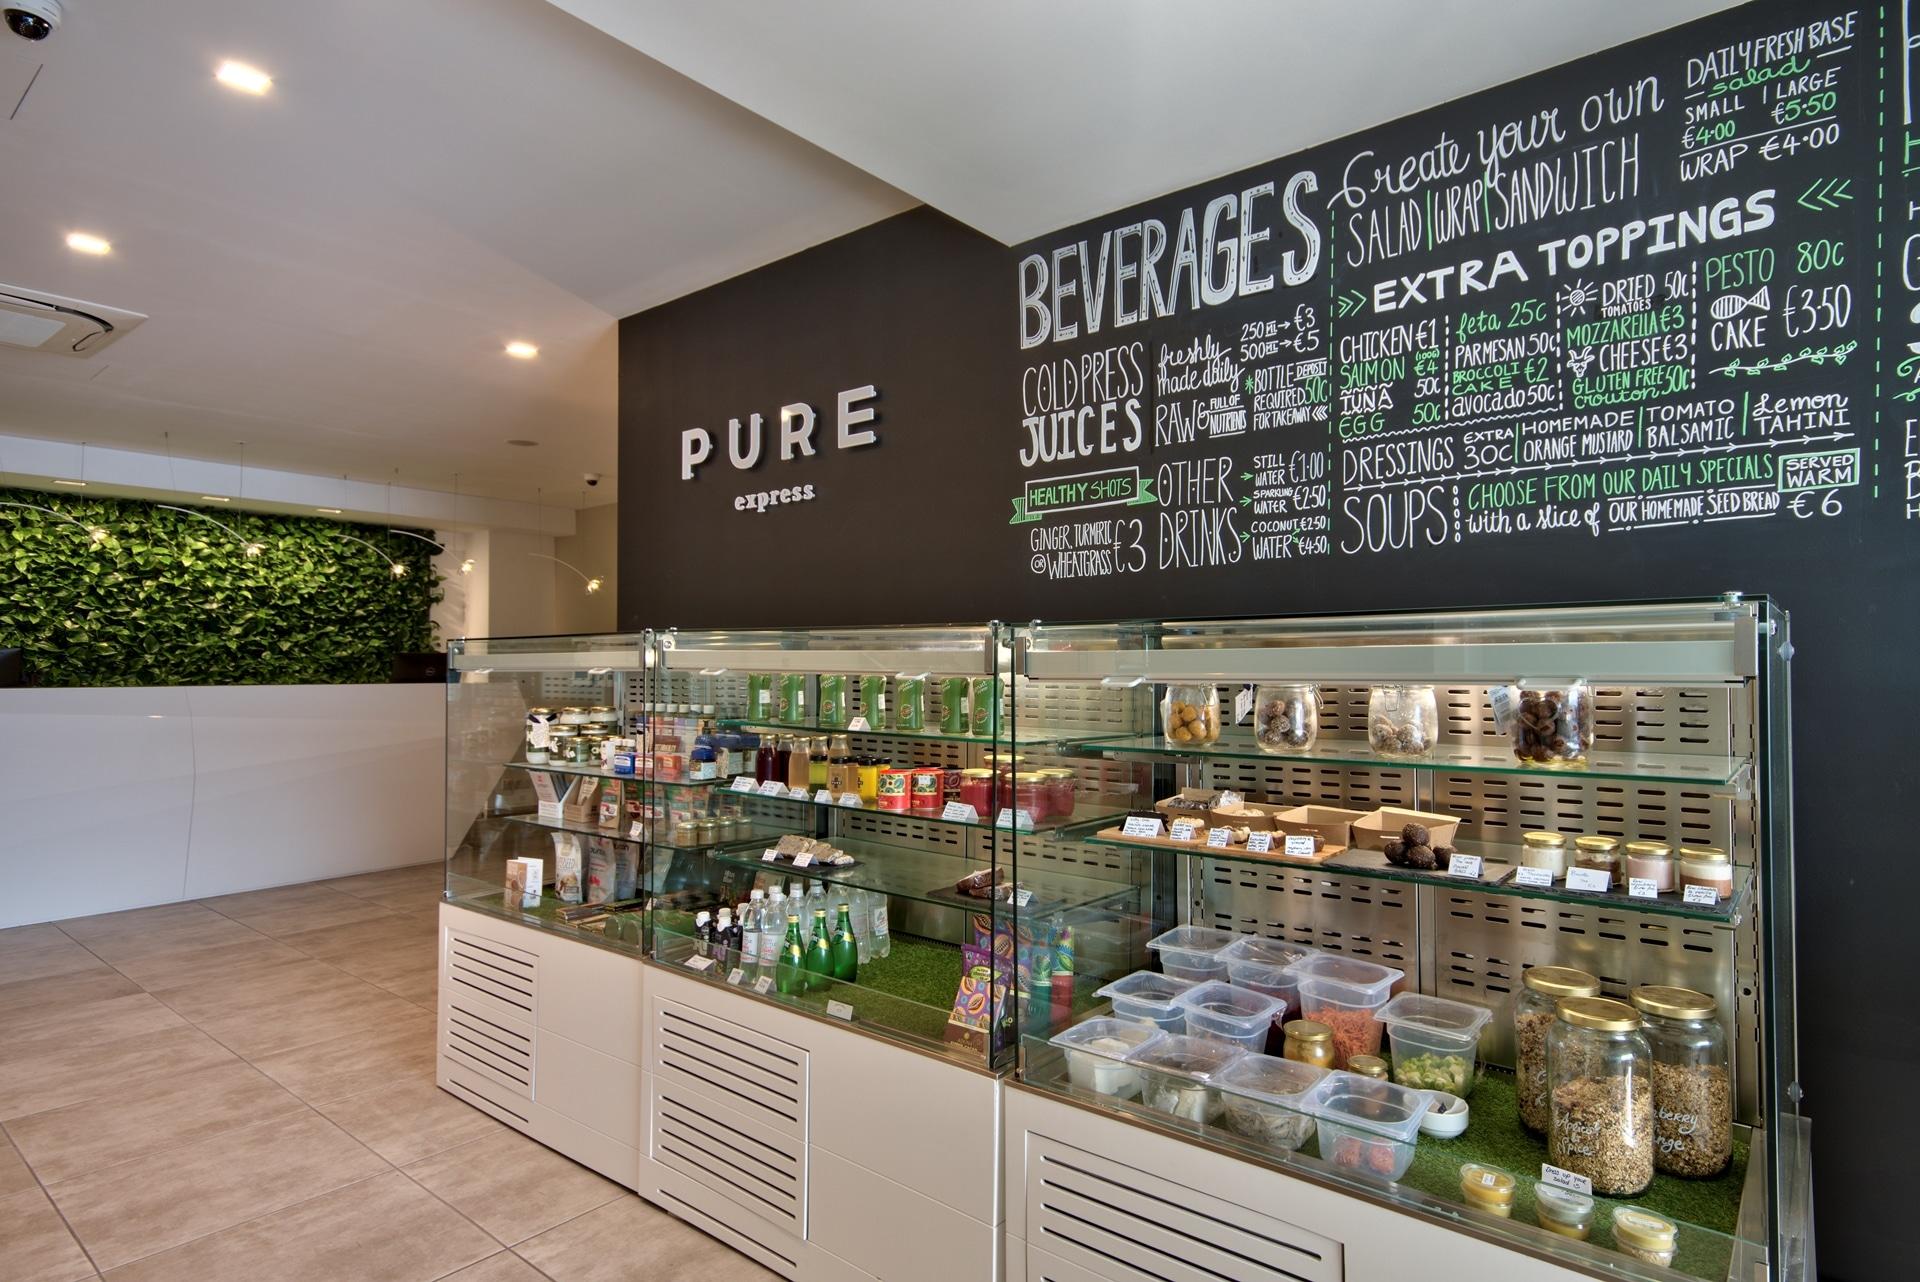 Juice Bar – counter space